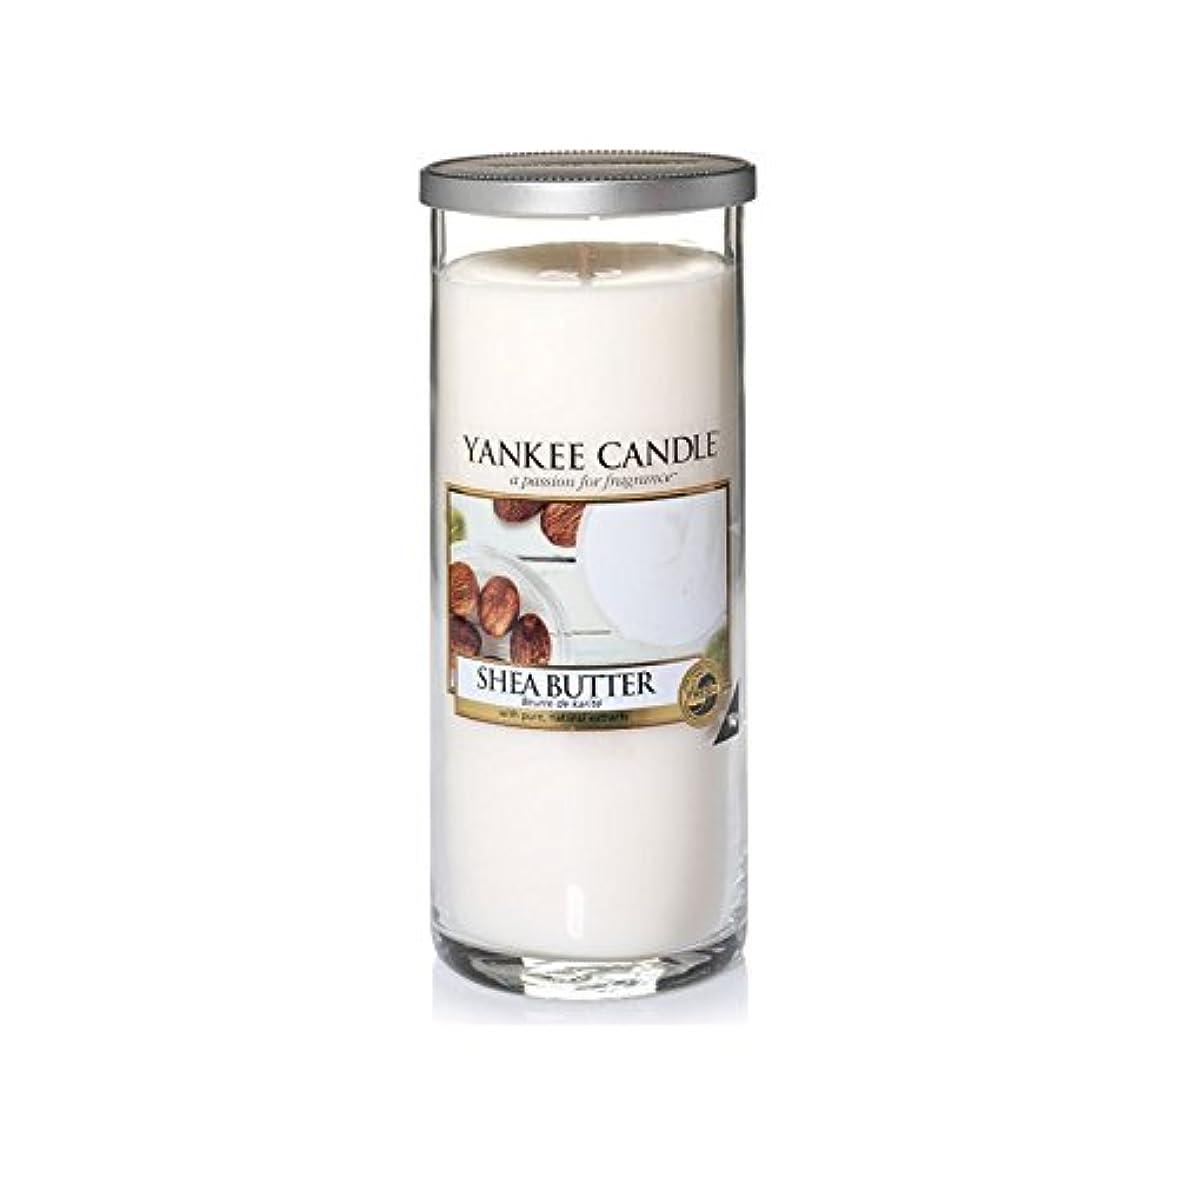 Yankee Candles Large Pillar Candle - Shea Butter (Pack of 6) - ヤンキーキャンドル大きな柱キャンドル - シアバター (x6) [並行輸入品]